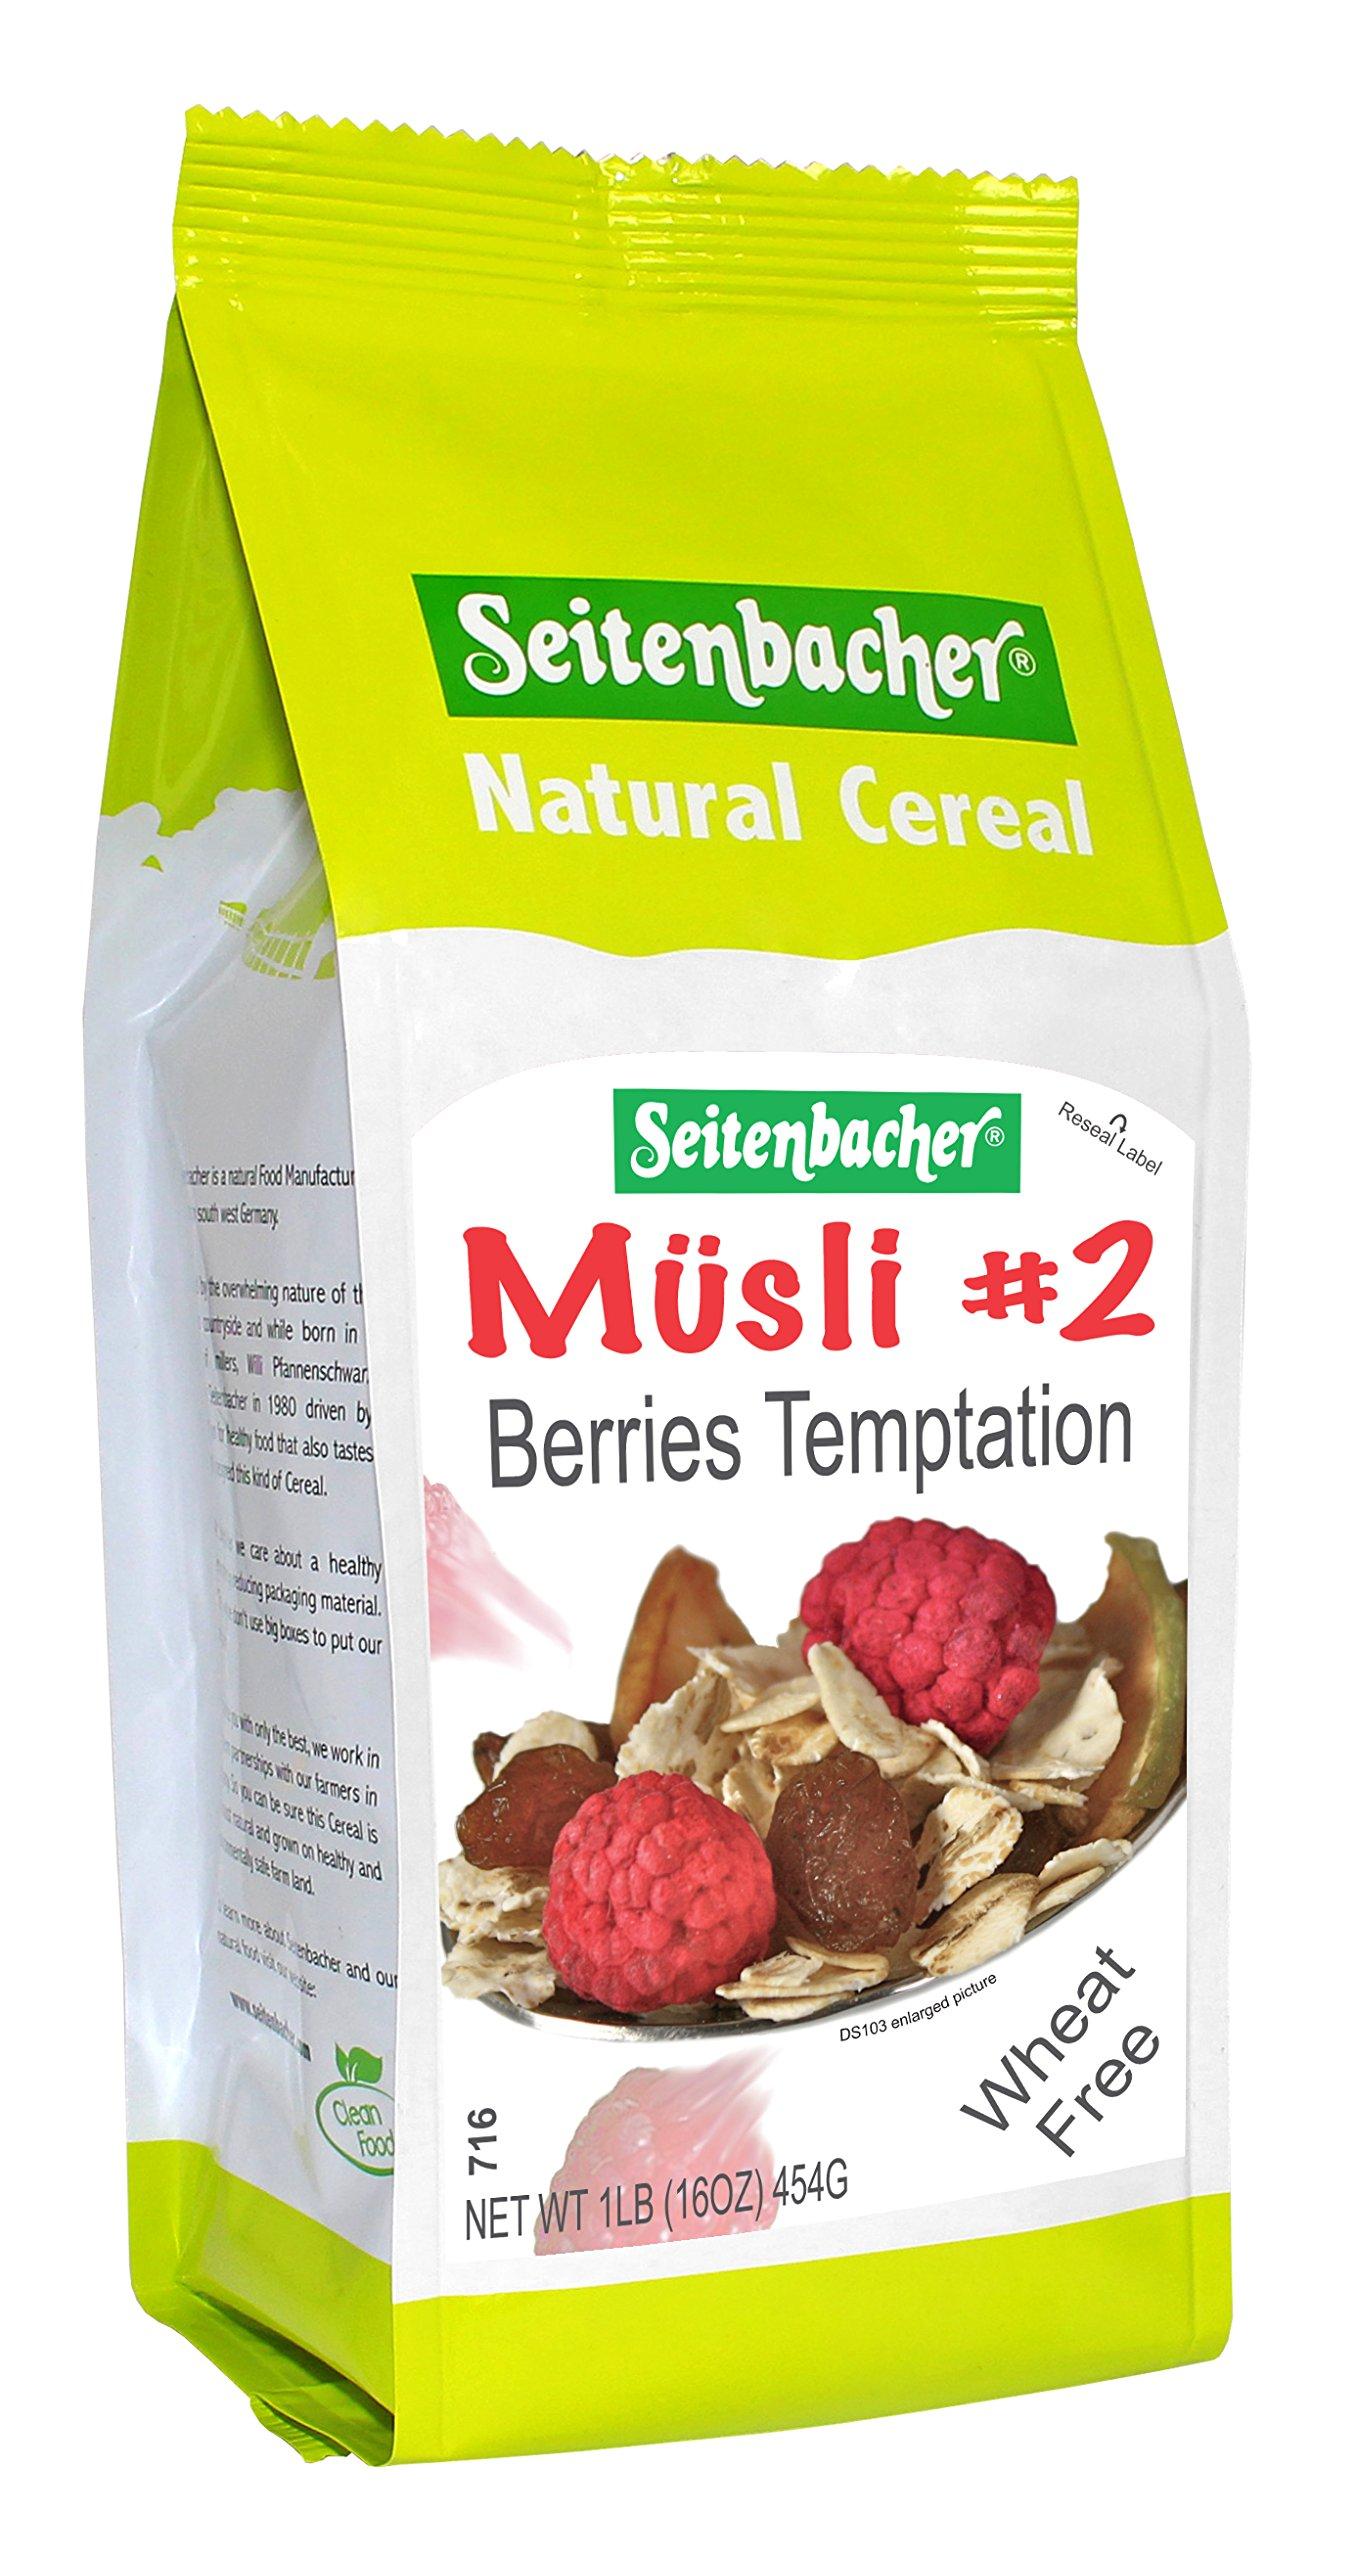 Seitenbacher All Natural Cereal #2 Musli Berries Temptation -- 1 lb - 2 pc by Seitenbacher (Image #1)